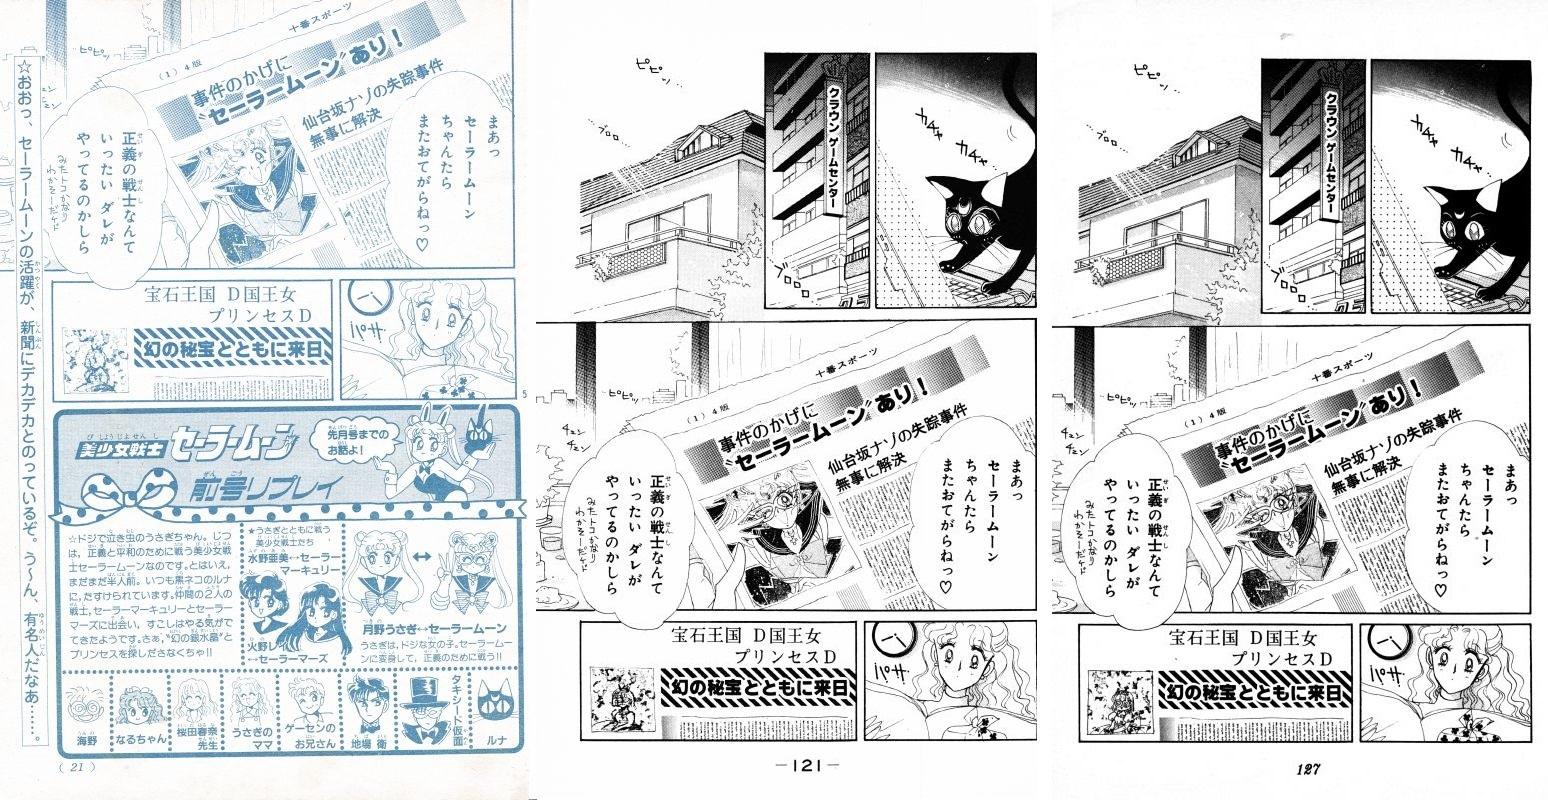 Act 4, Page 2 – Nakayoshi, Original, Remaster